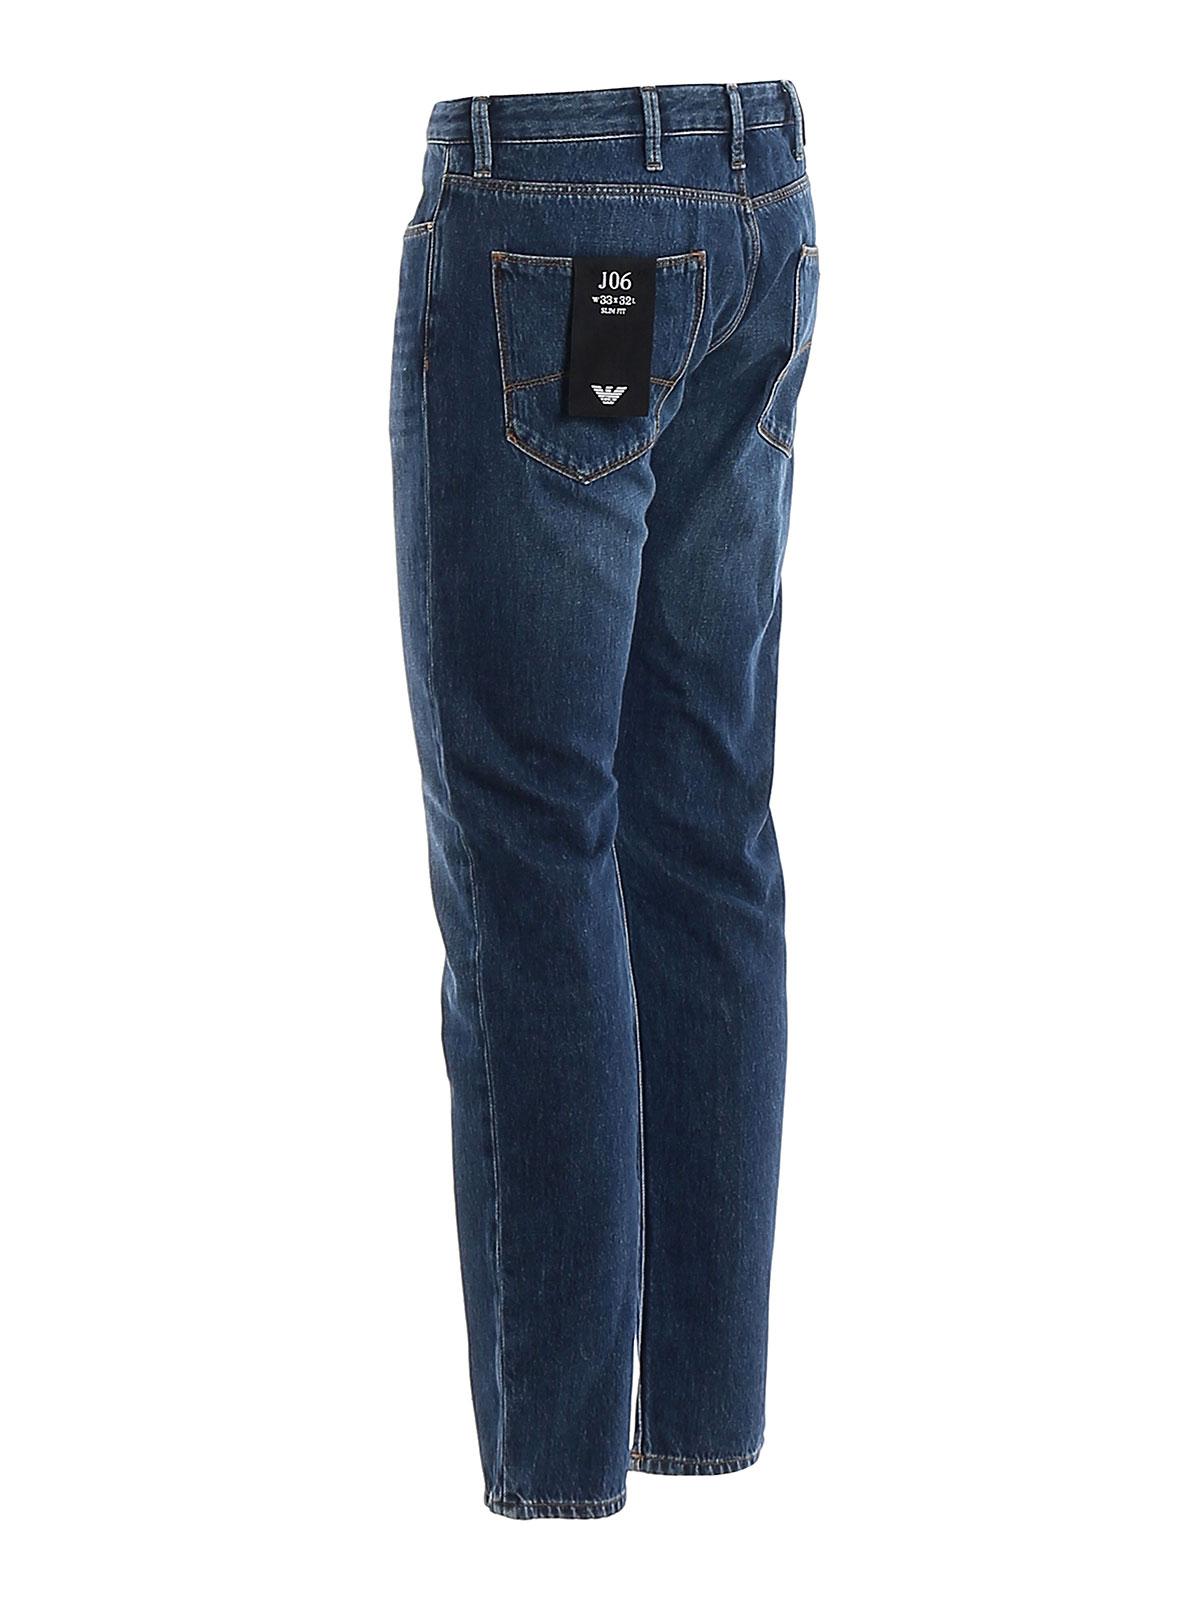 Picture of EMPORIO ARMANI | Men's 5 Pockets Jeans J06